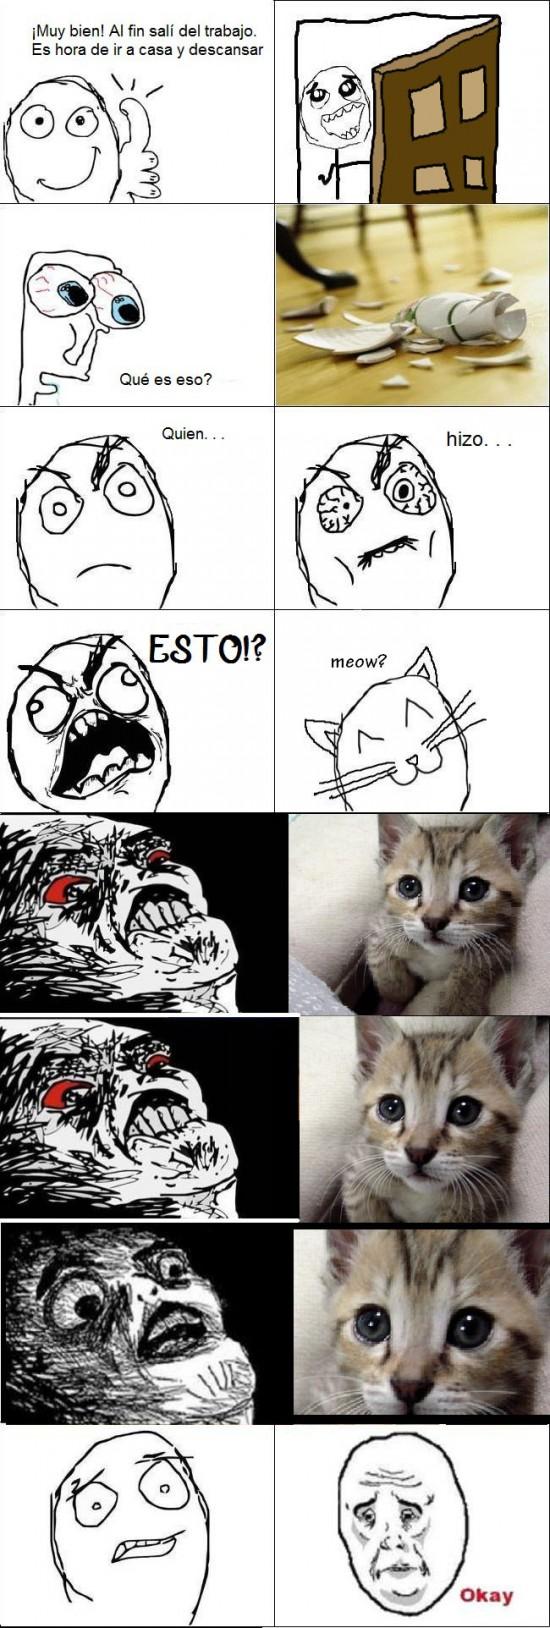 gato,inglip,okay